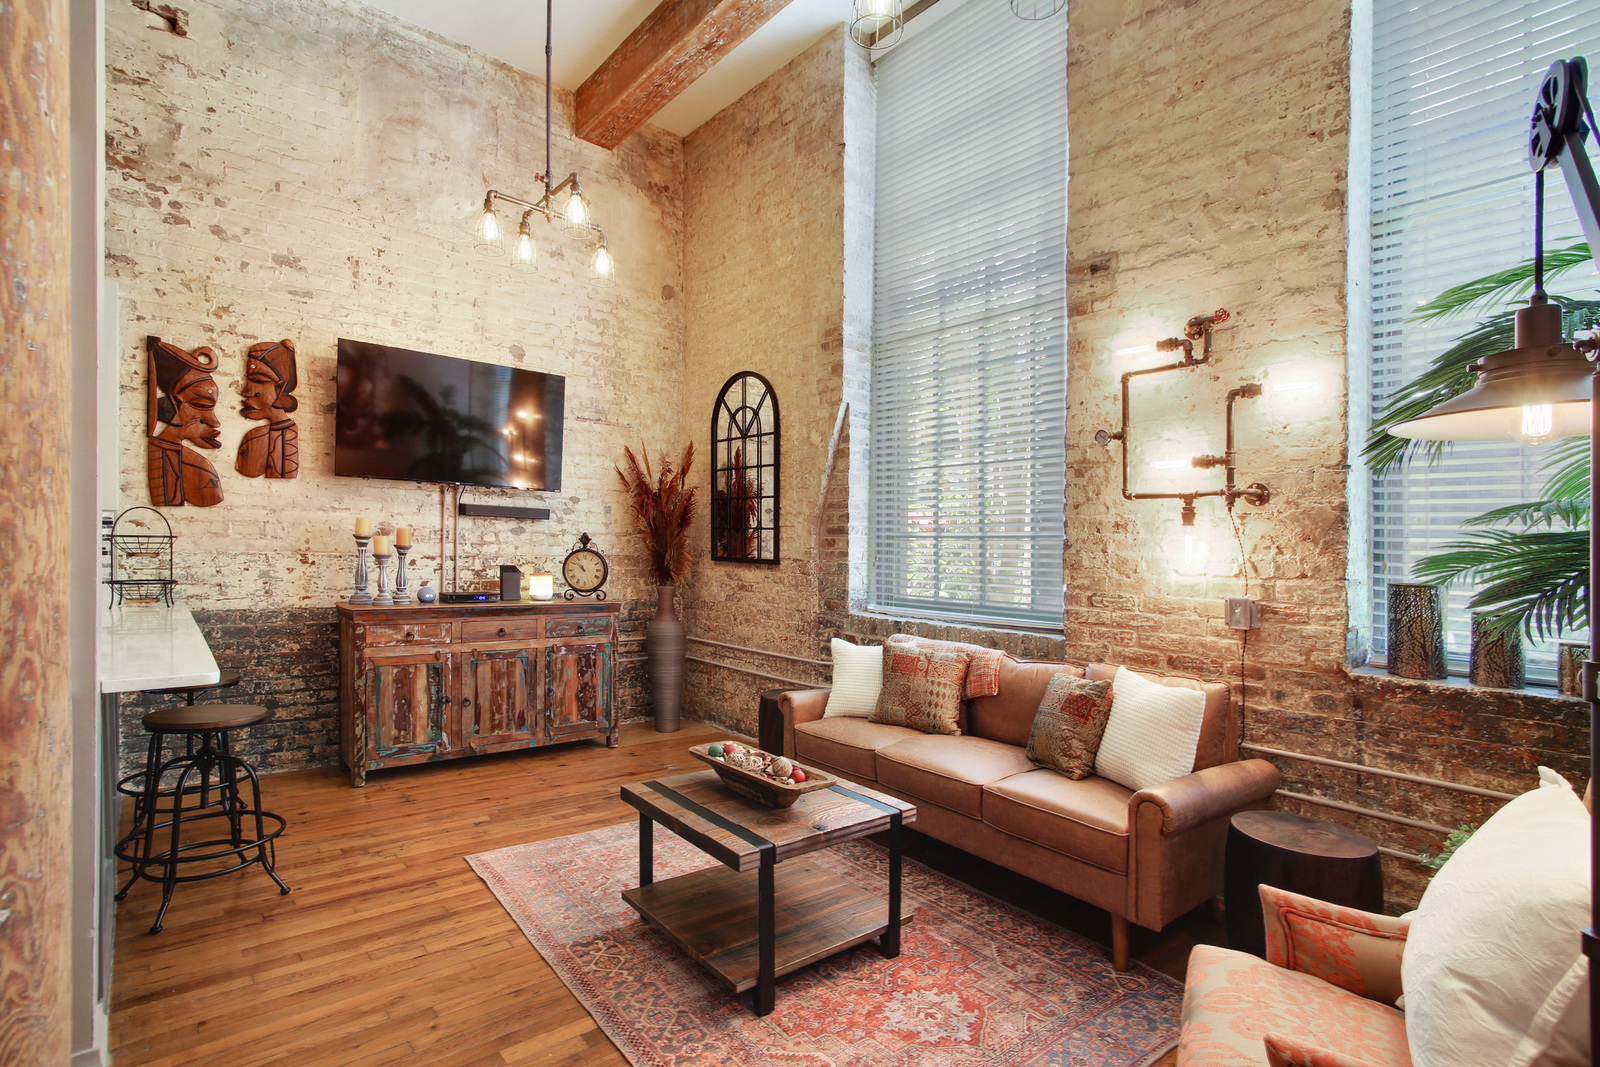 CBD/Warehouse District/South Market, Condo, 1 beds, 1.0 baths, $2800 per month New Orleans Rental - devie image_2